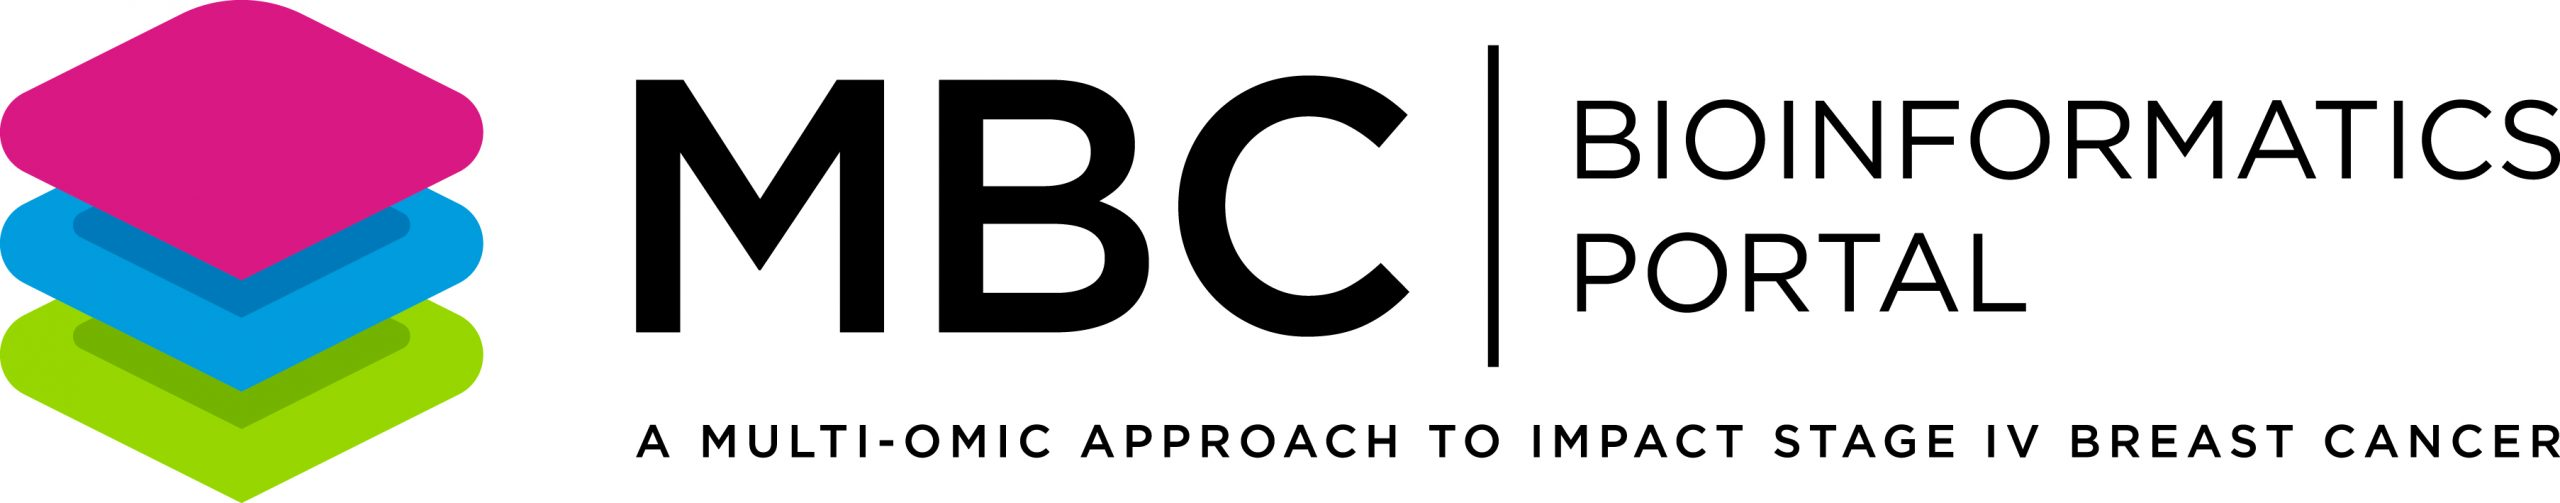 MBC Bioinformatics Portal Logo